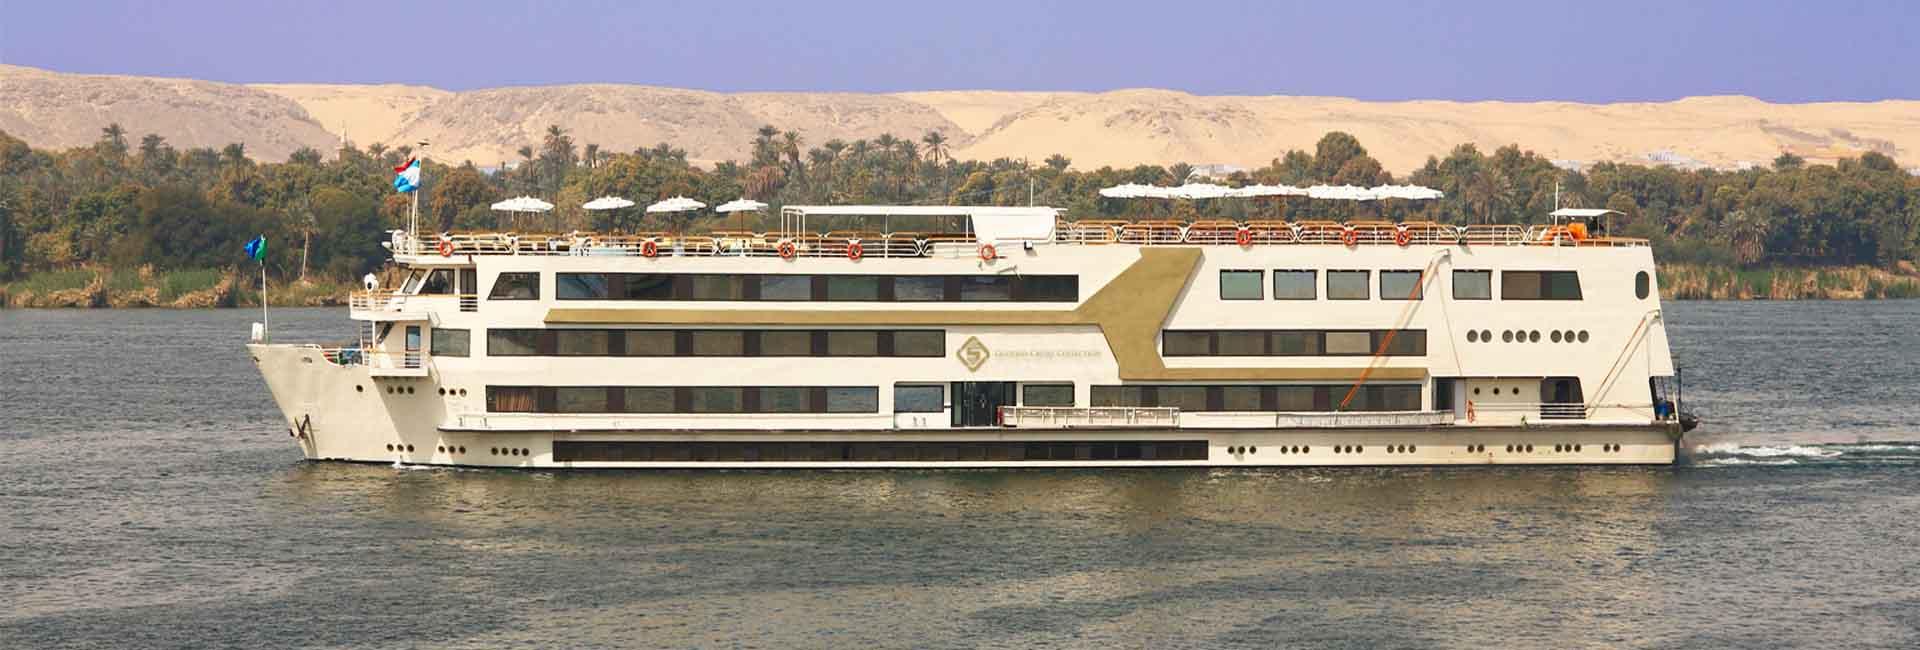 Sonesta Nile Goddess Nile Cruise Ship